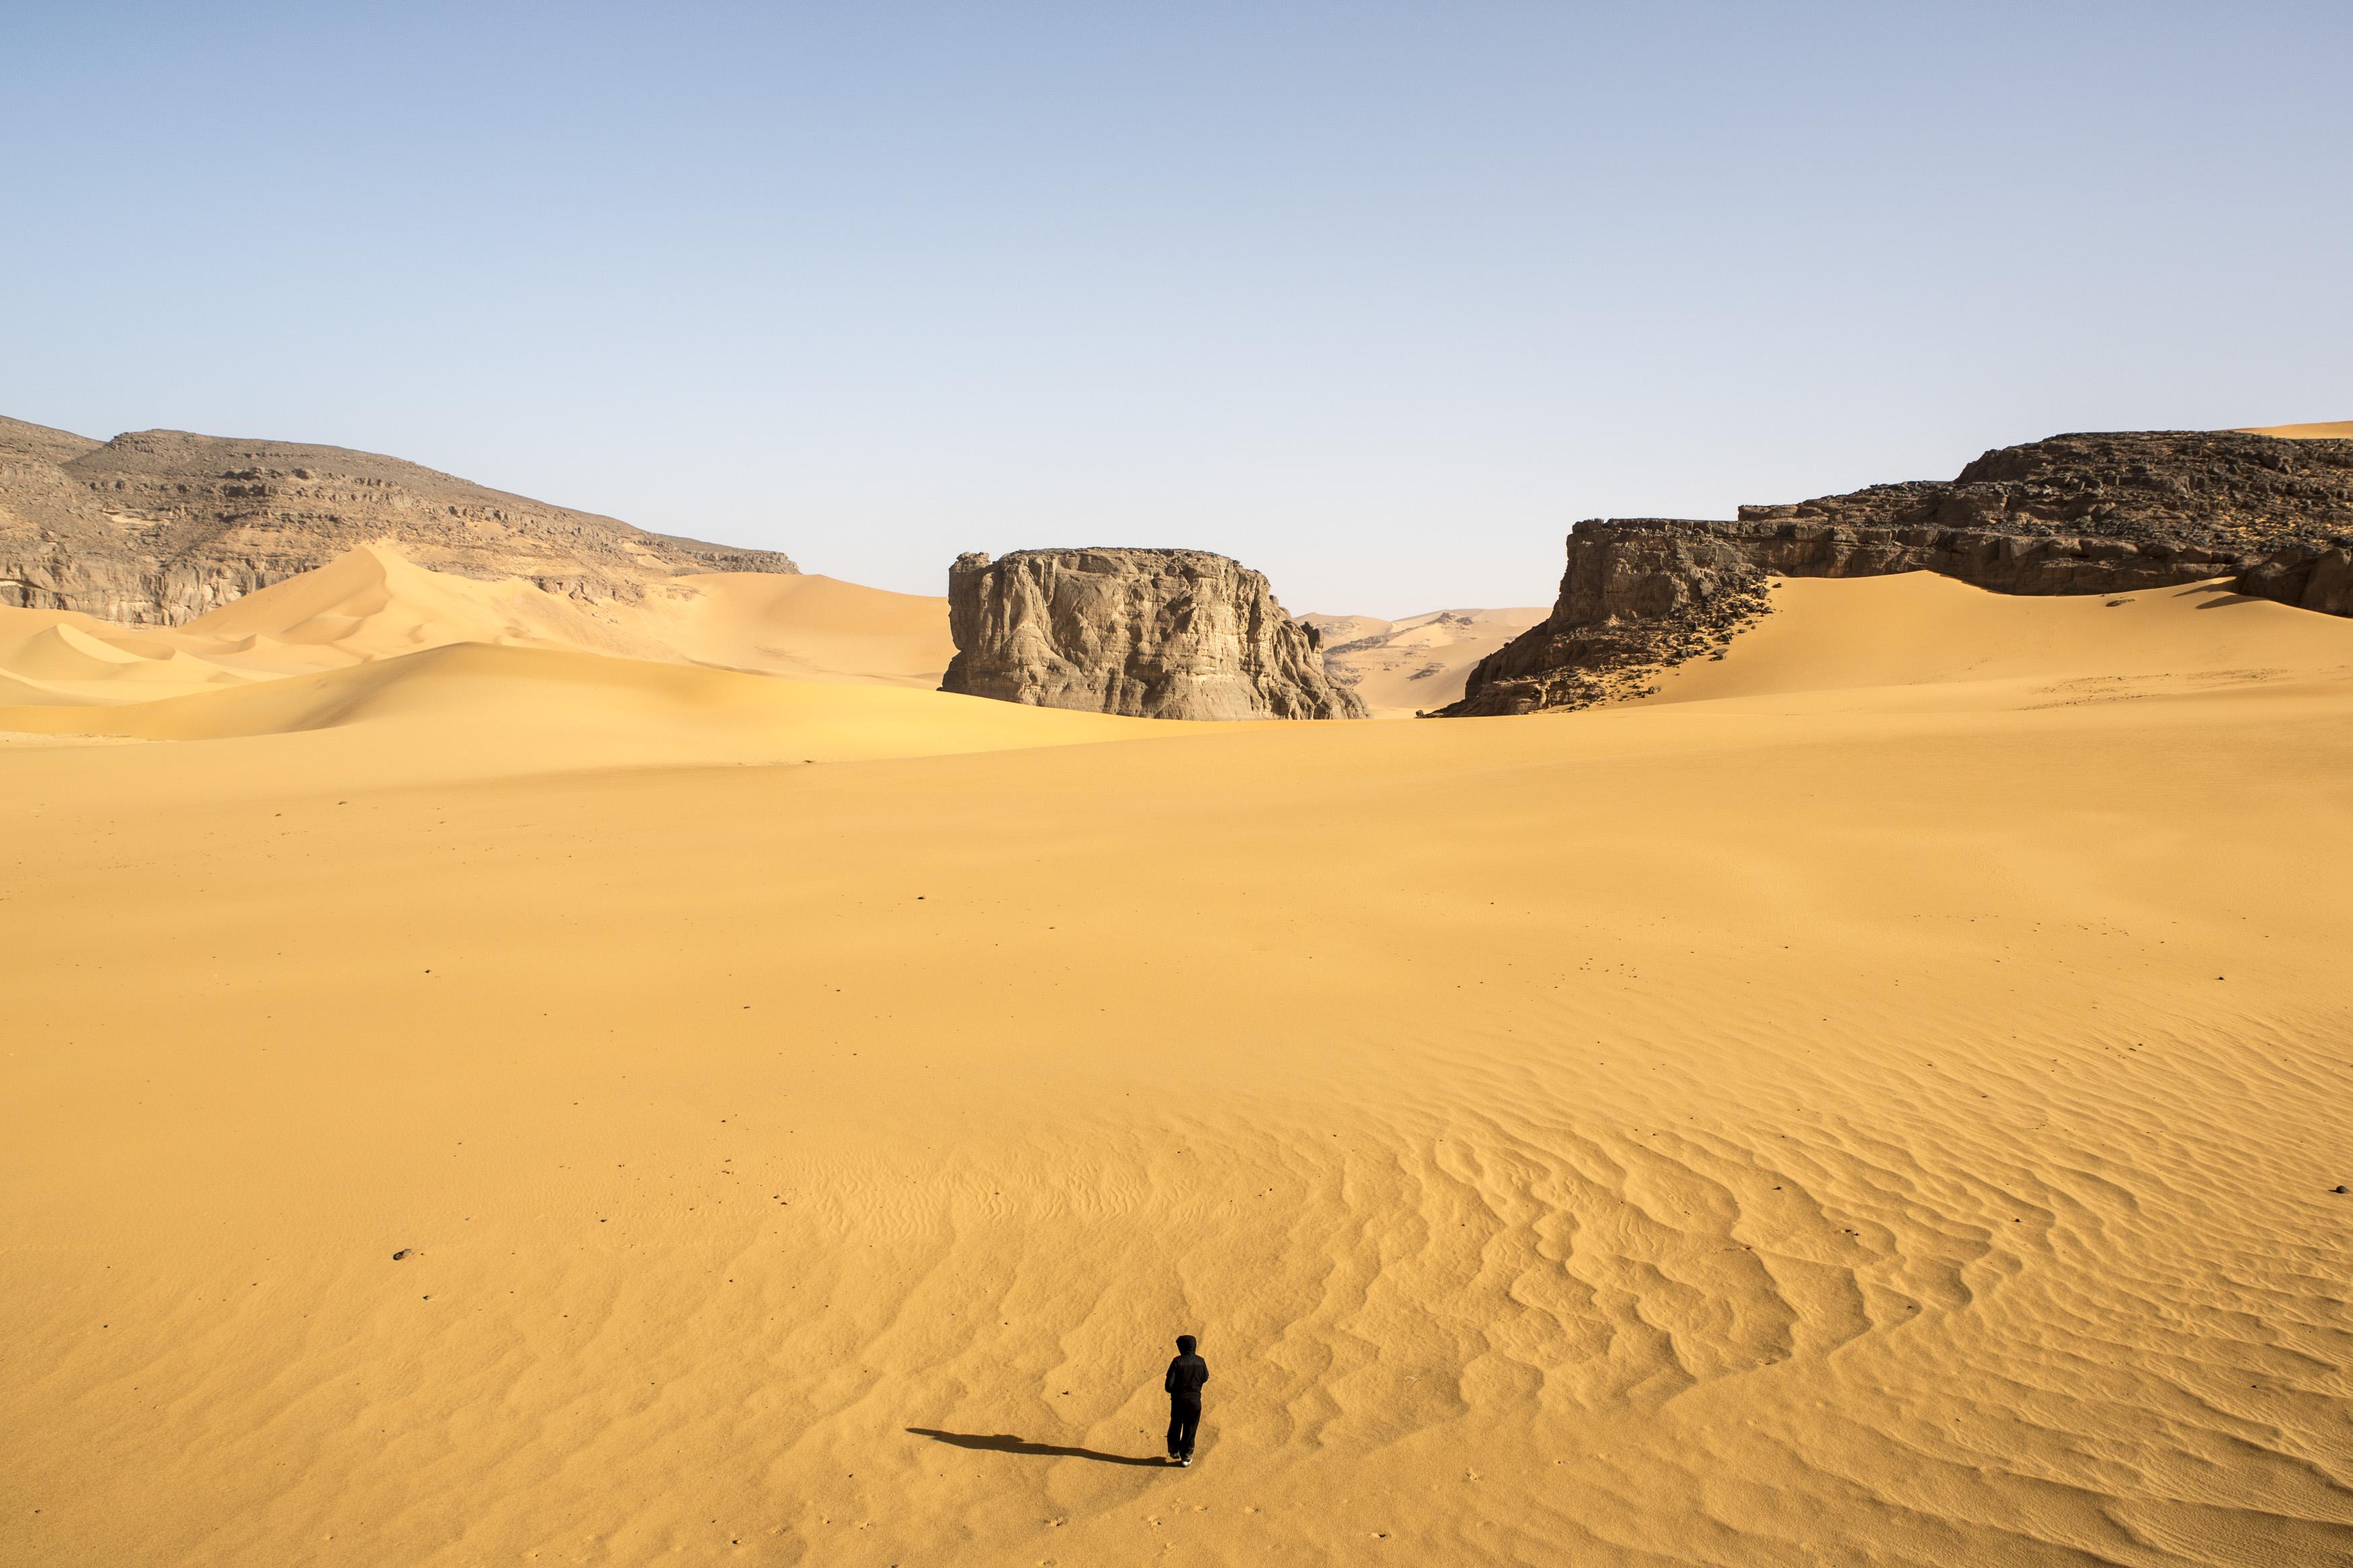 One man is walking alone in the Tadrart.The Tadrart (200 km southeast of Djanet) is located in the south of the Tassili N'Ajjer National Park and is part of one of the most beautiful desert in the world but above all the central Sahara.From huge canyons to cliffs carved with rocky peaks of various shapes mix with dunes of colored sand with yellow and red reflections. The Tadrart, Algeria-February 8, 2017. Un homme marche seul dans la Tadrart. La Tadrart (200 km au sud-est de Djanet) se situe dans le sud du Parc National du Tassili N'Ajjer et il fait partie d'un des plus beau désert au monde mais avant tout du Sahara central. D'immenses canyons aux falaises sculptées avec de pitons rocheux aux formes les plus diverses  se mélangent avec des dunes de sable coloré aux reflets jaune et rouge. La Tadrart, Algérie-8 février 2017.